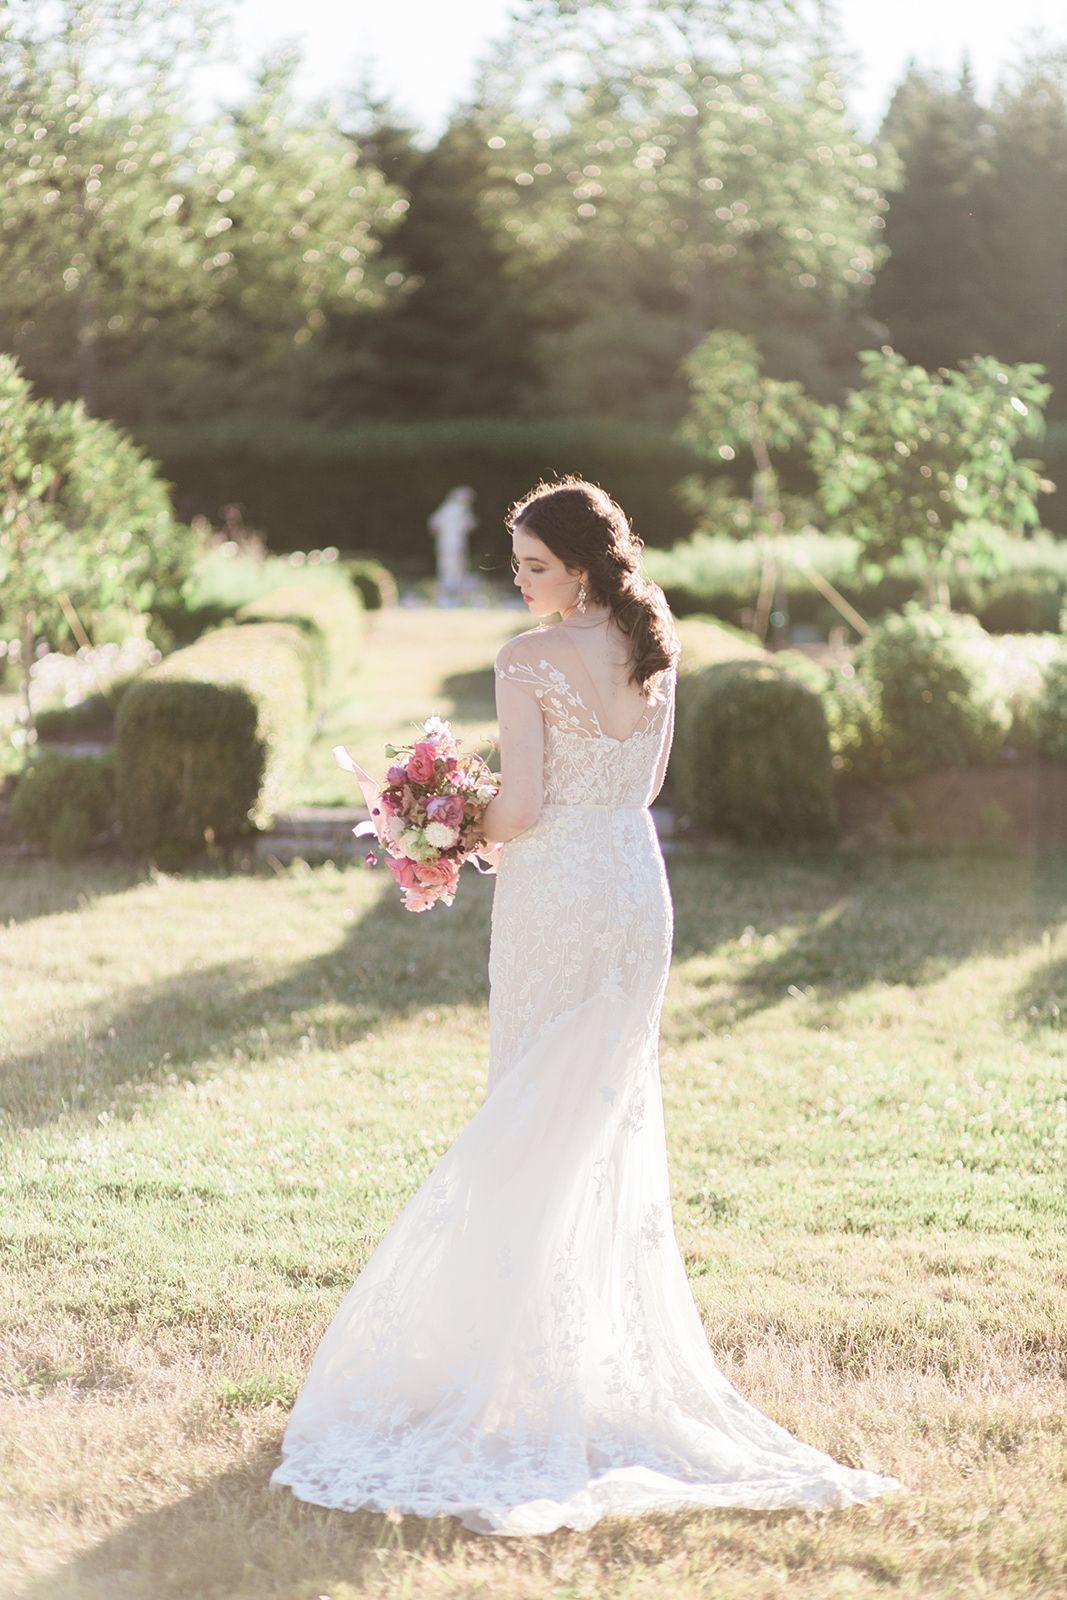 Wed In Modern Elegance At Lush Countryside Vineyard Modern Minimalist Wedding Dream Wedding Dresses Lace Weddings [ 1600 x 1067 Pixel ]